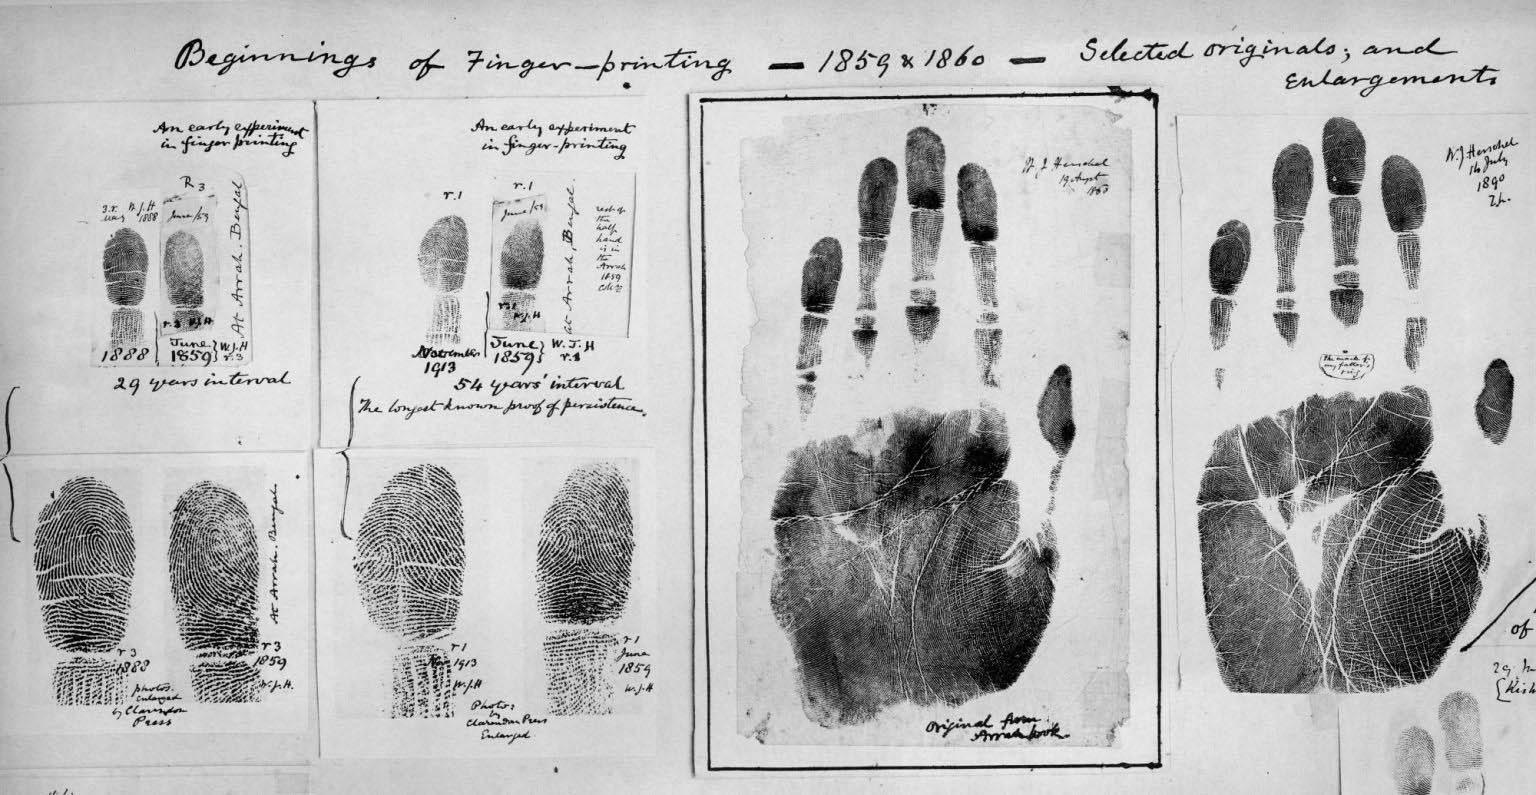 https://recfaces.com/wp-content/uploads/2020/12/fingerprints.jpg